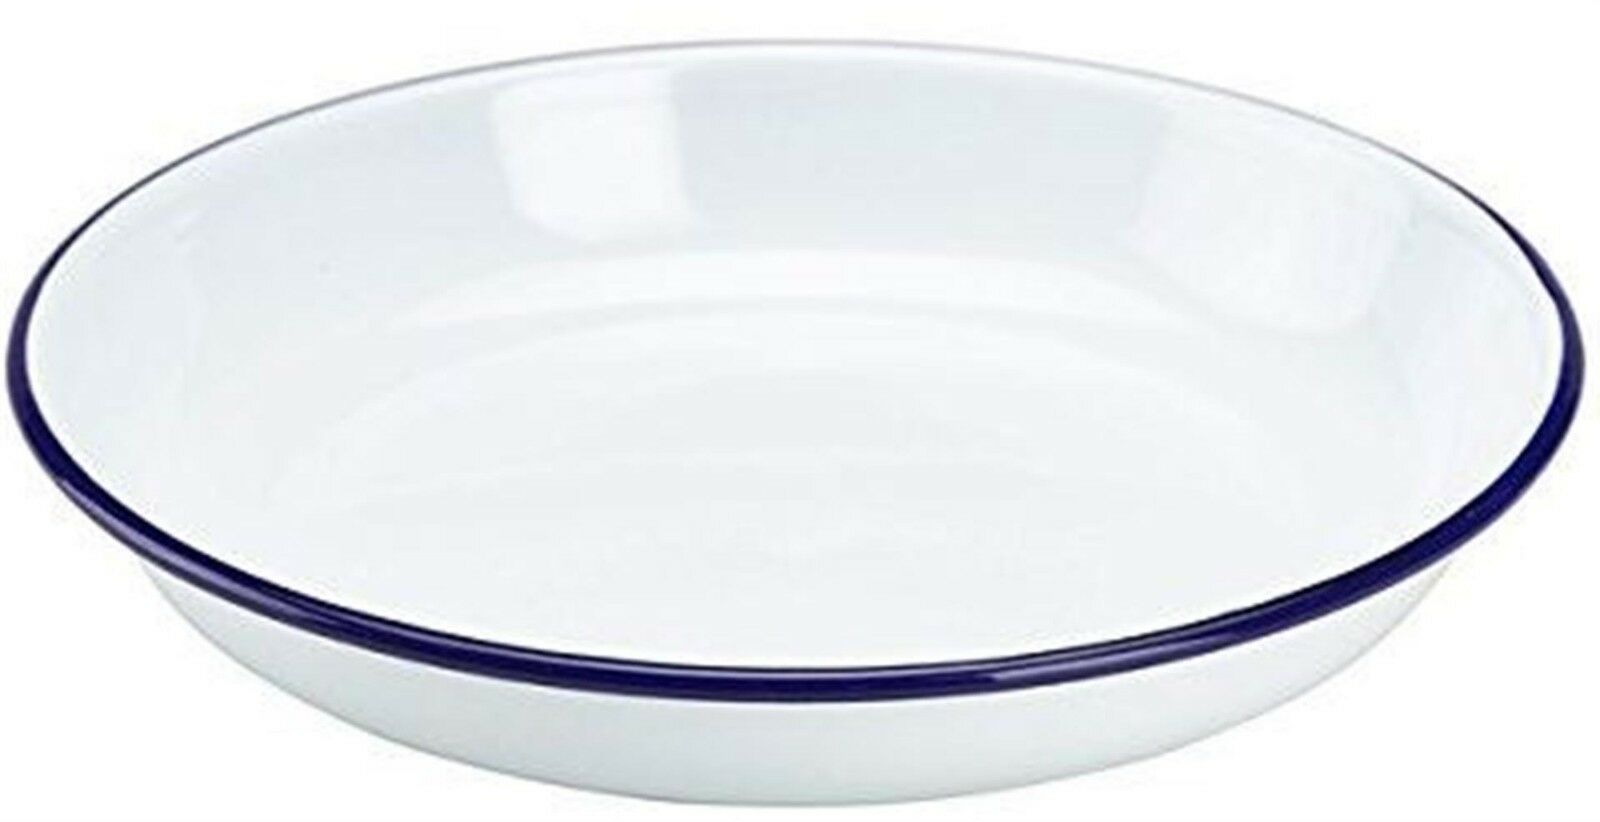 12x 12x 12x 24cm Enamel Rice Plate Pasta Weiß Blau Rim Camping 4WD Home Caravan Kitchen ce1b8b